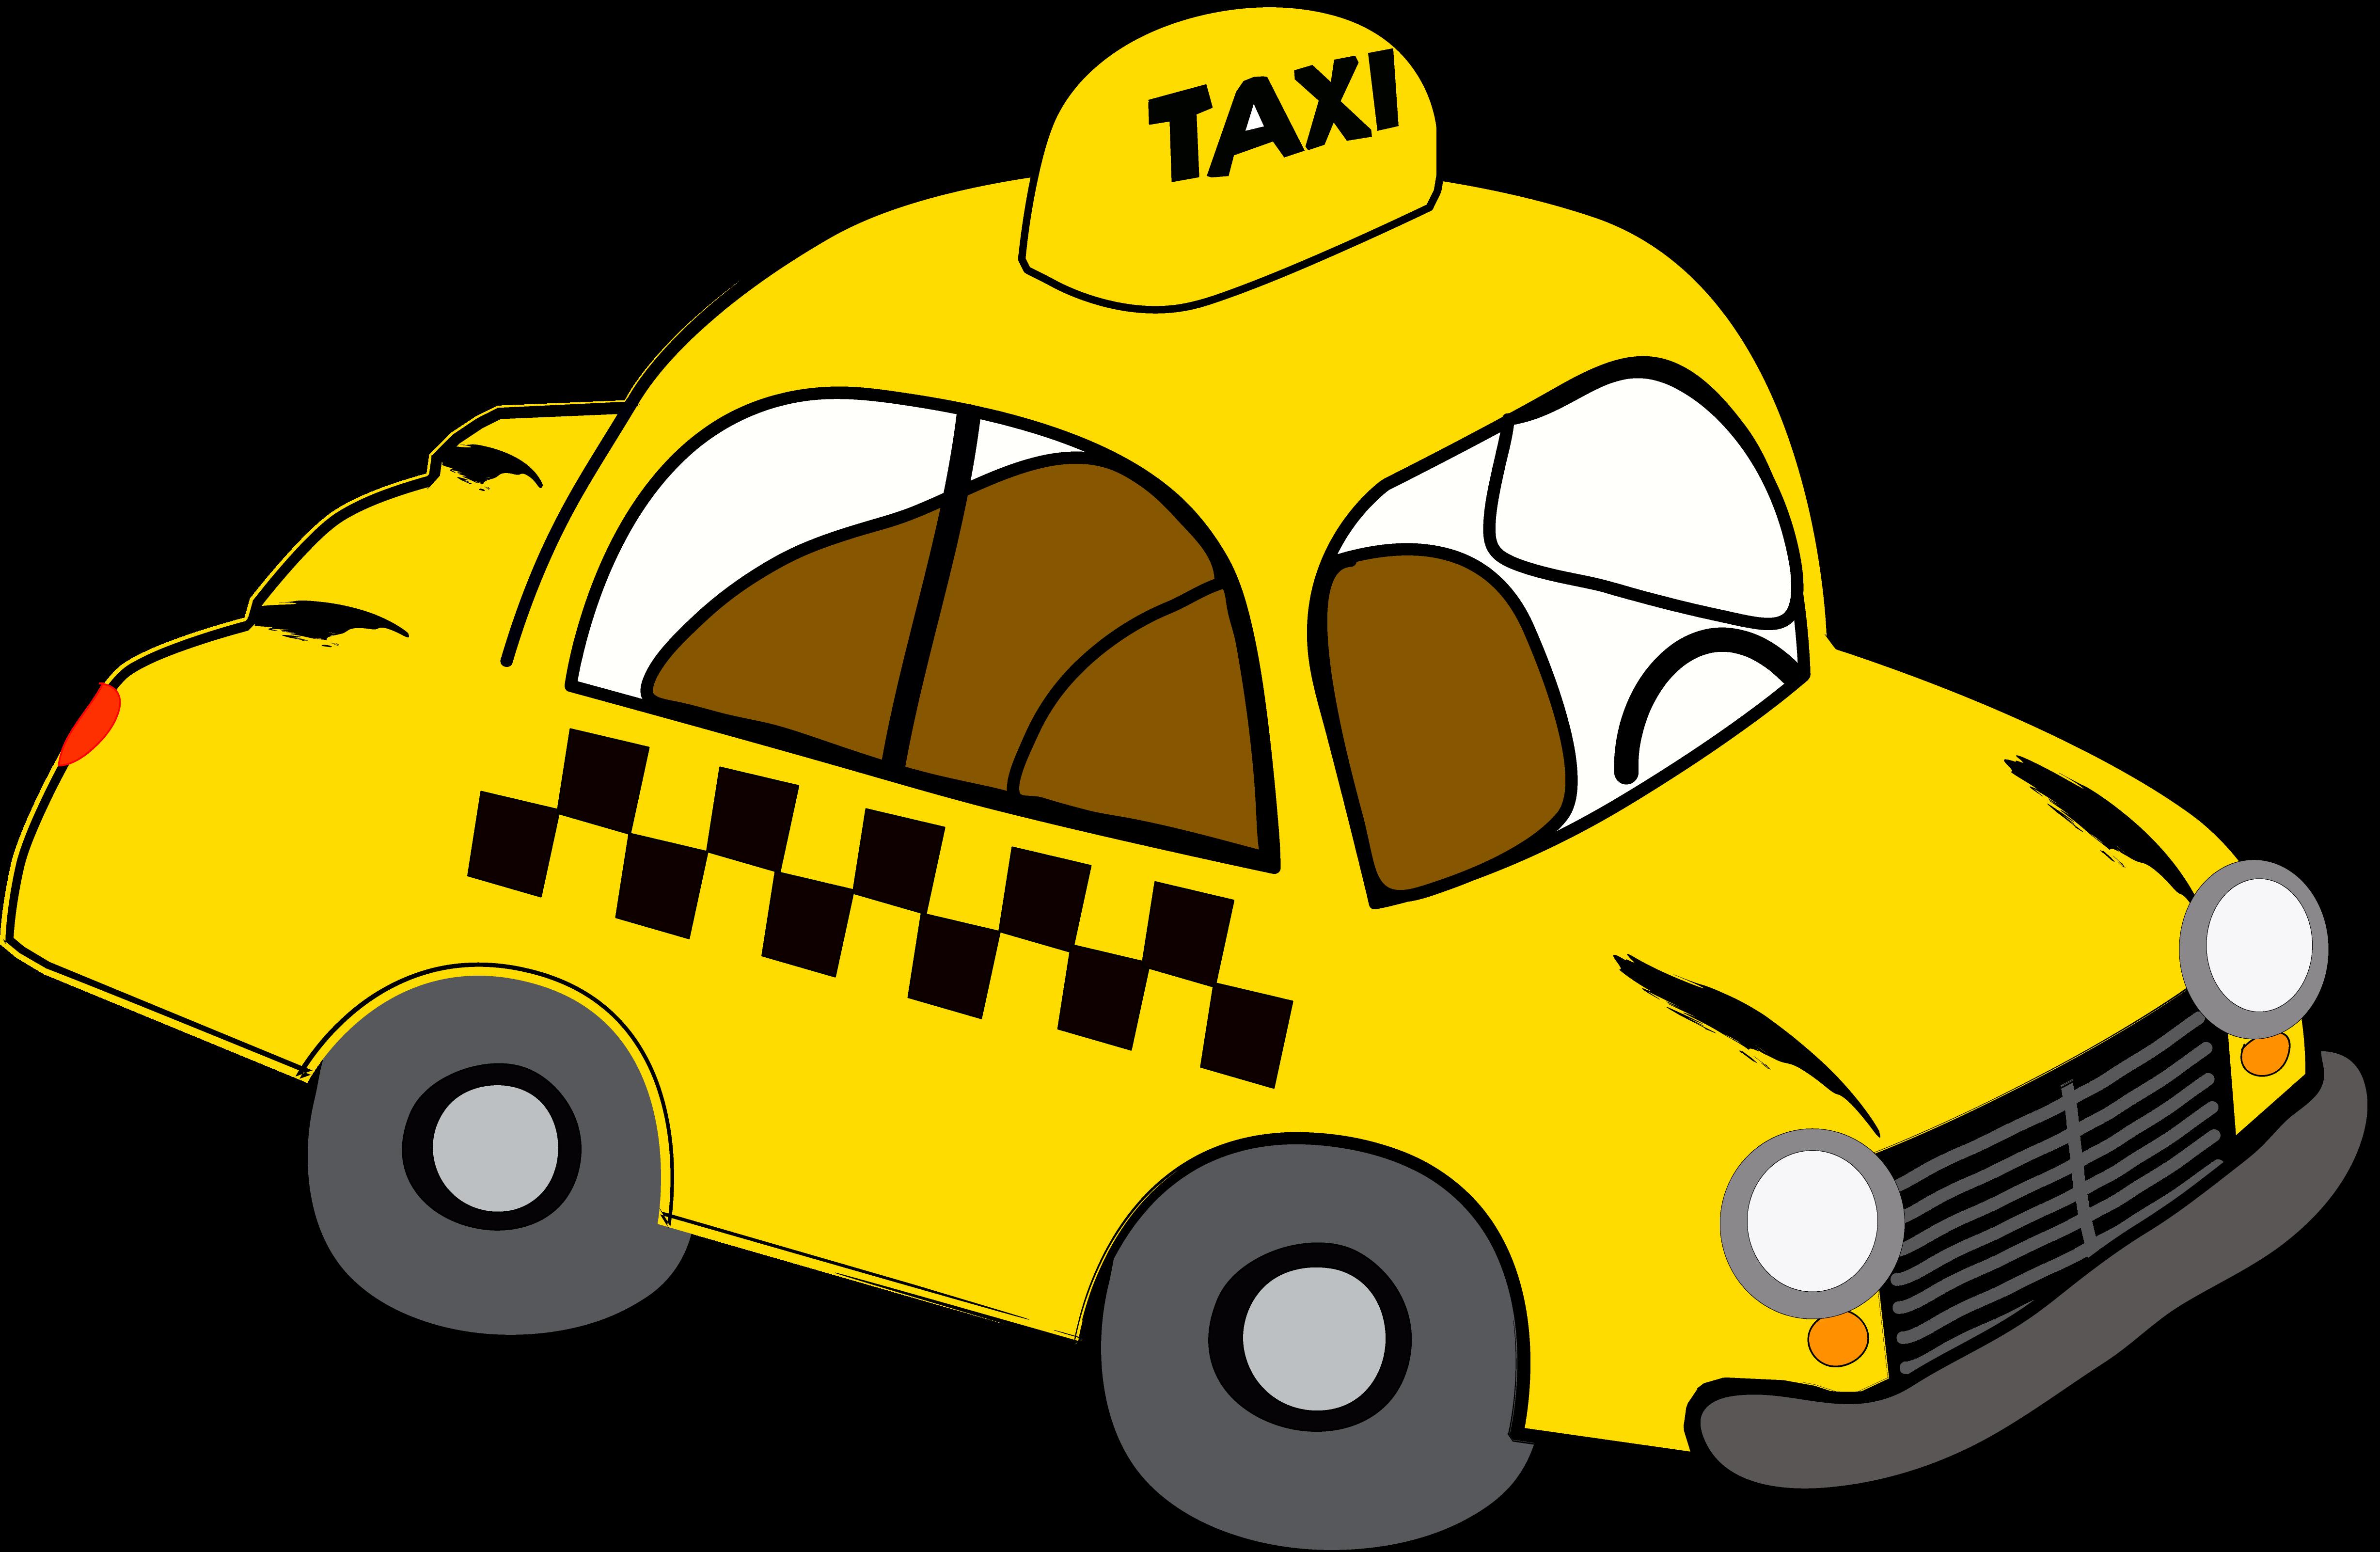 Smiley clipart car. Taxi yellow cab stock